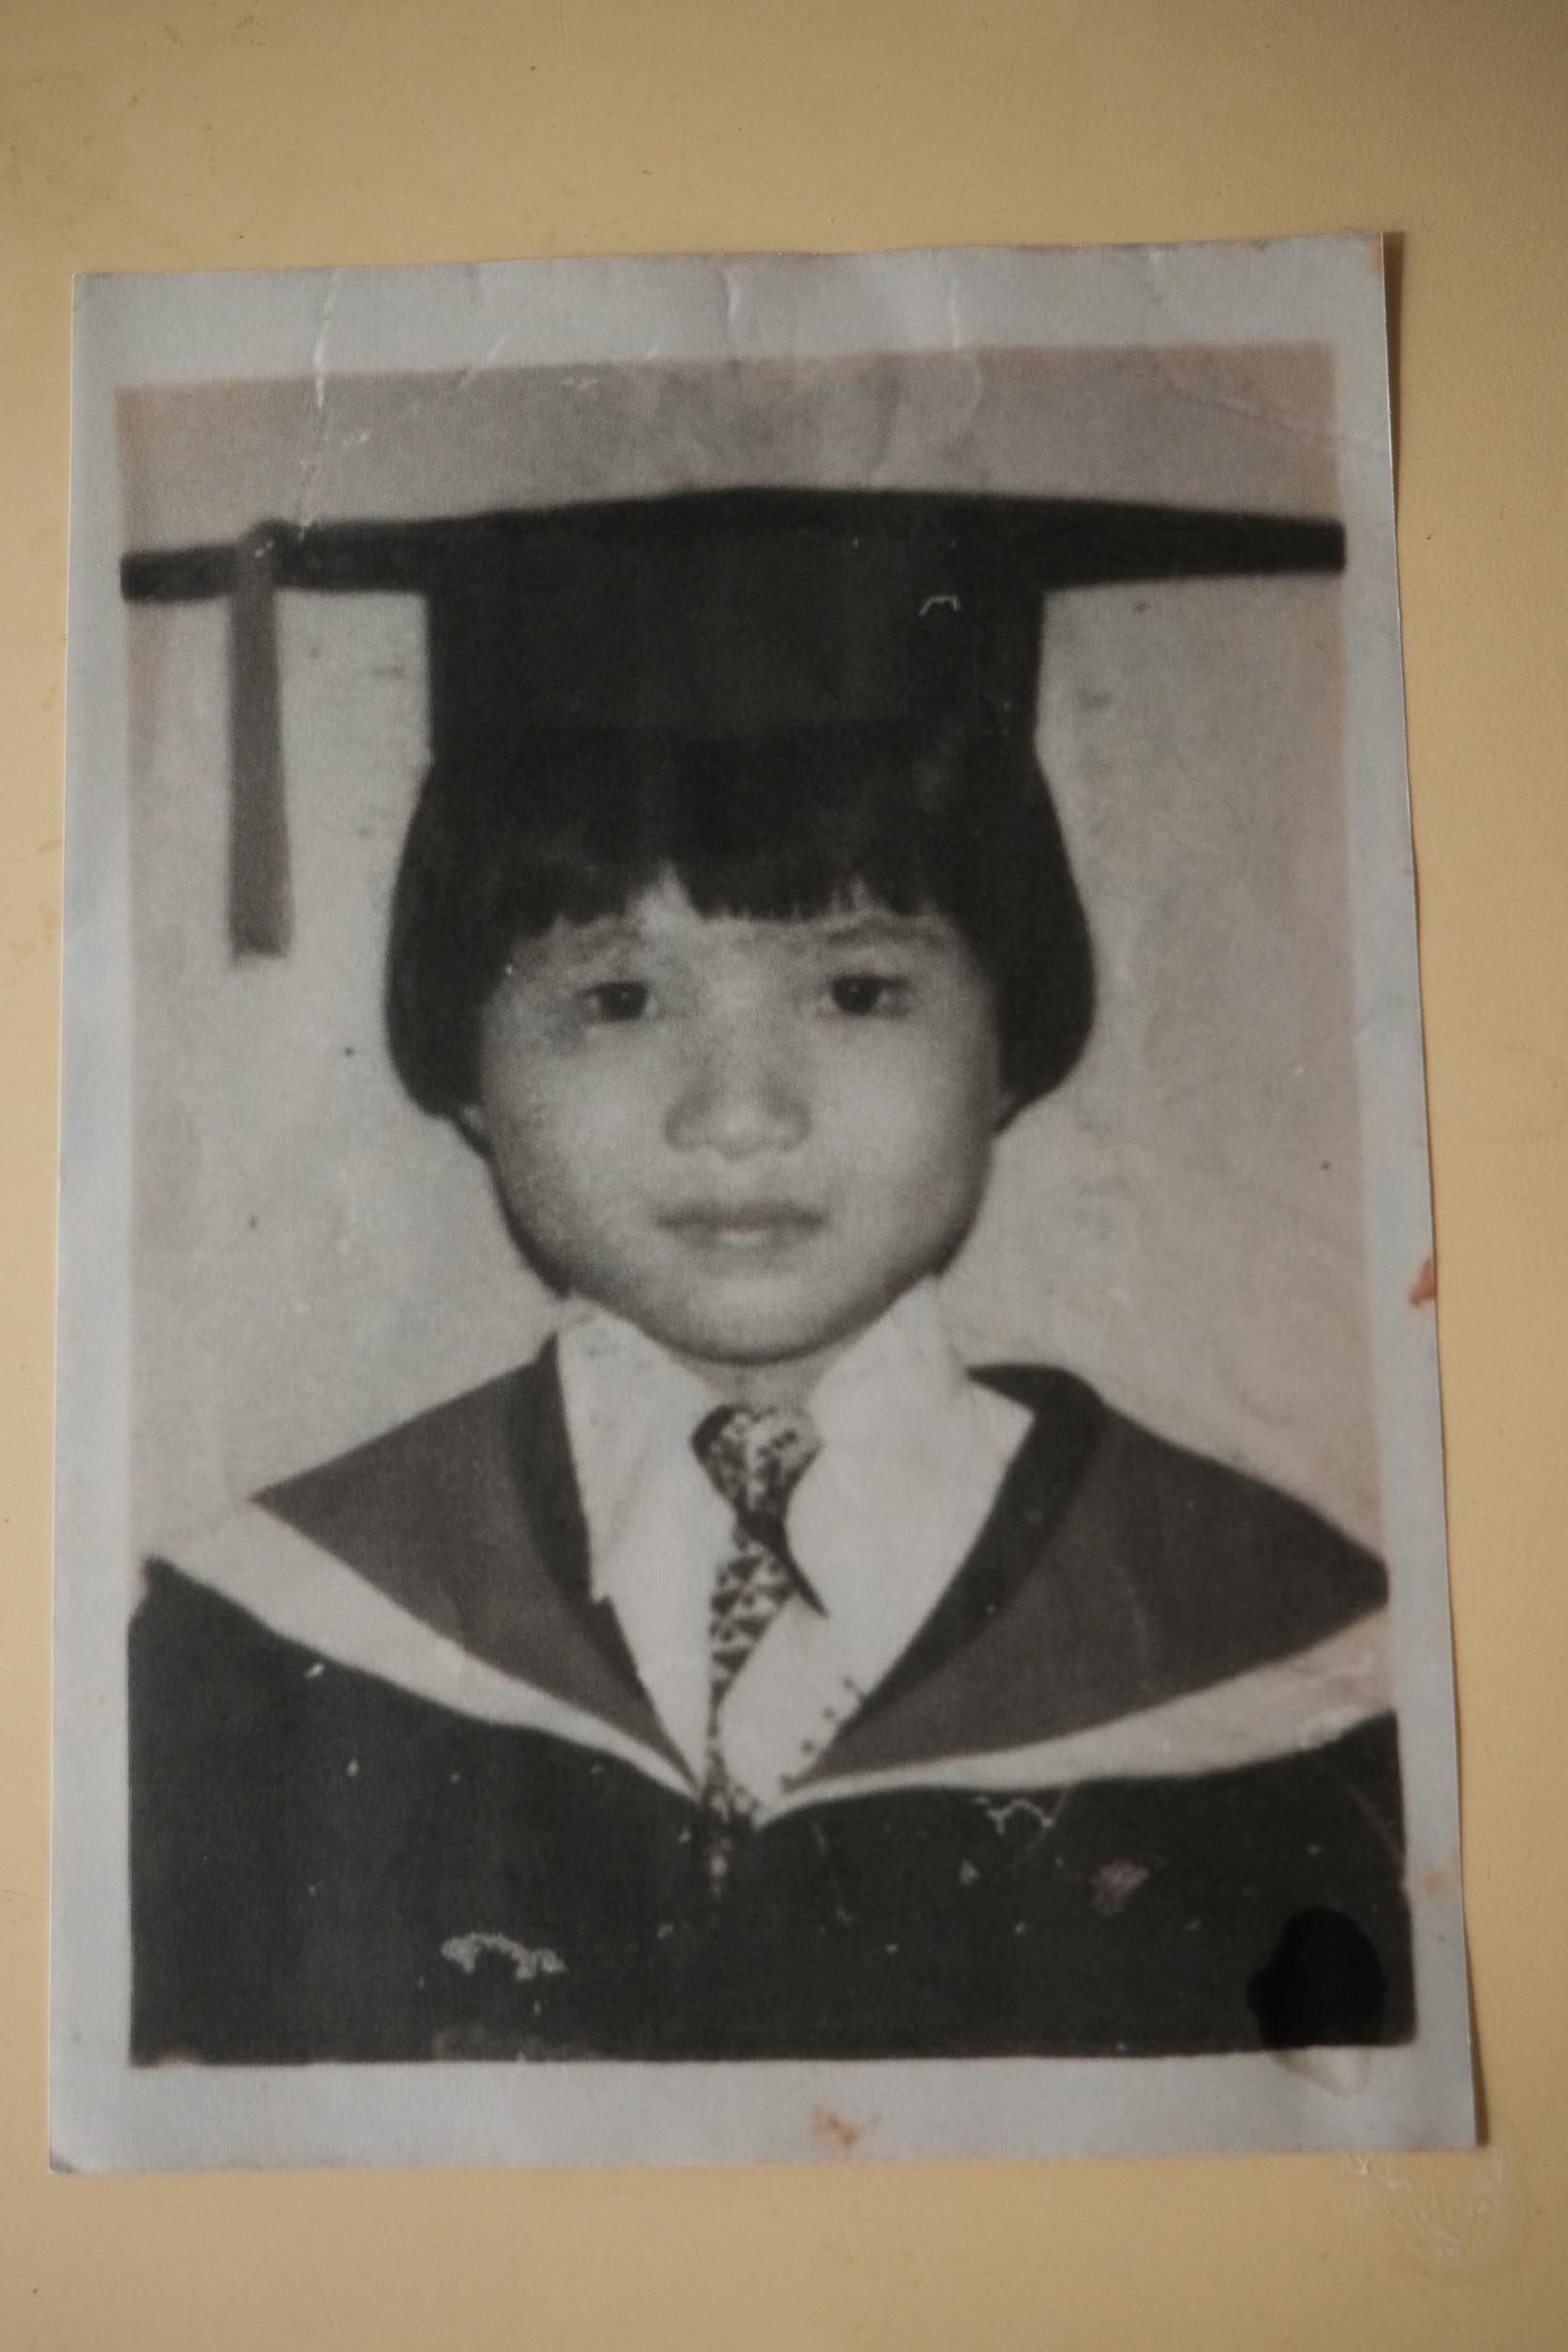 Image of Goh Beng Choo